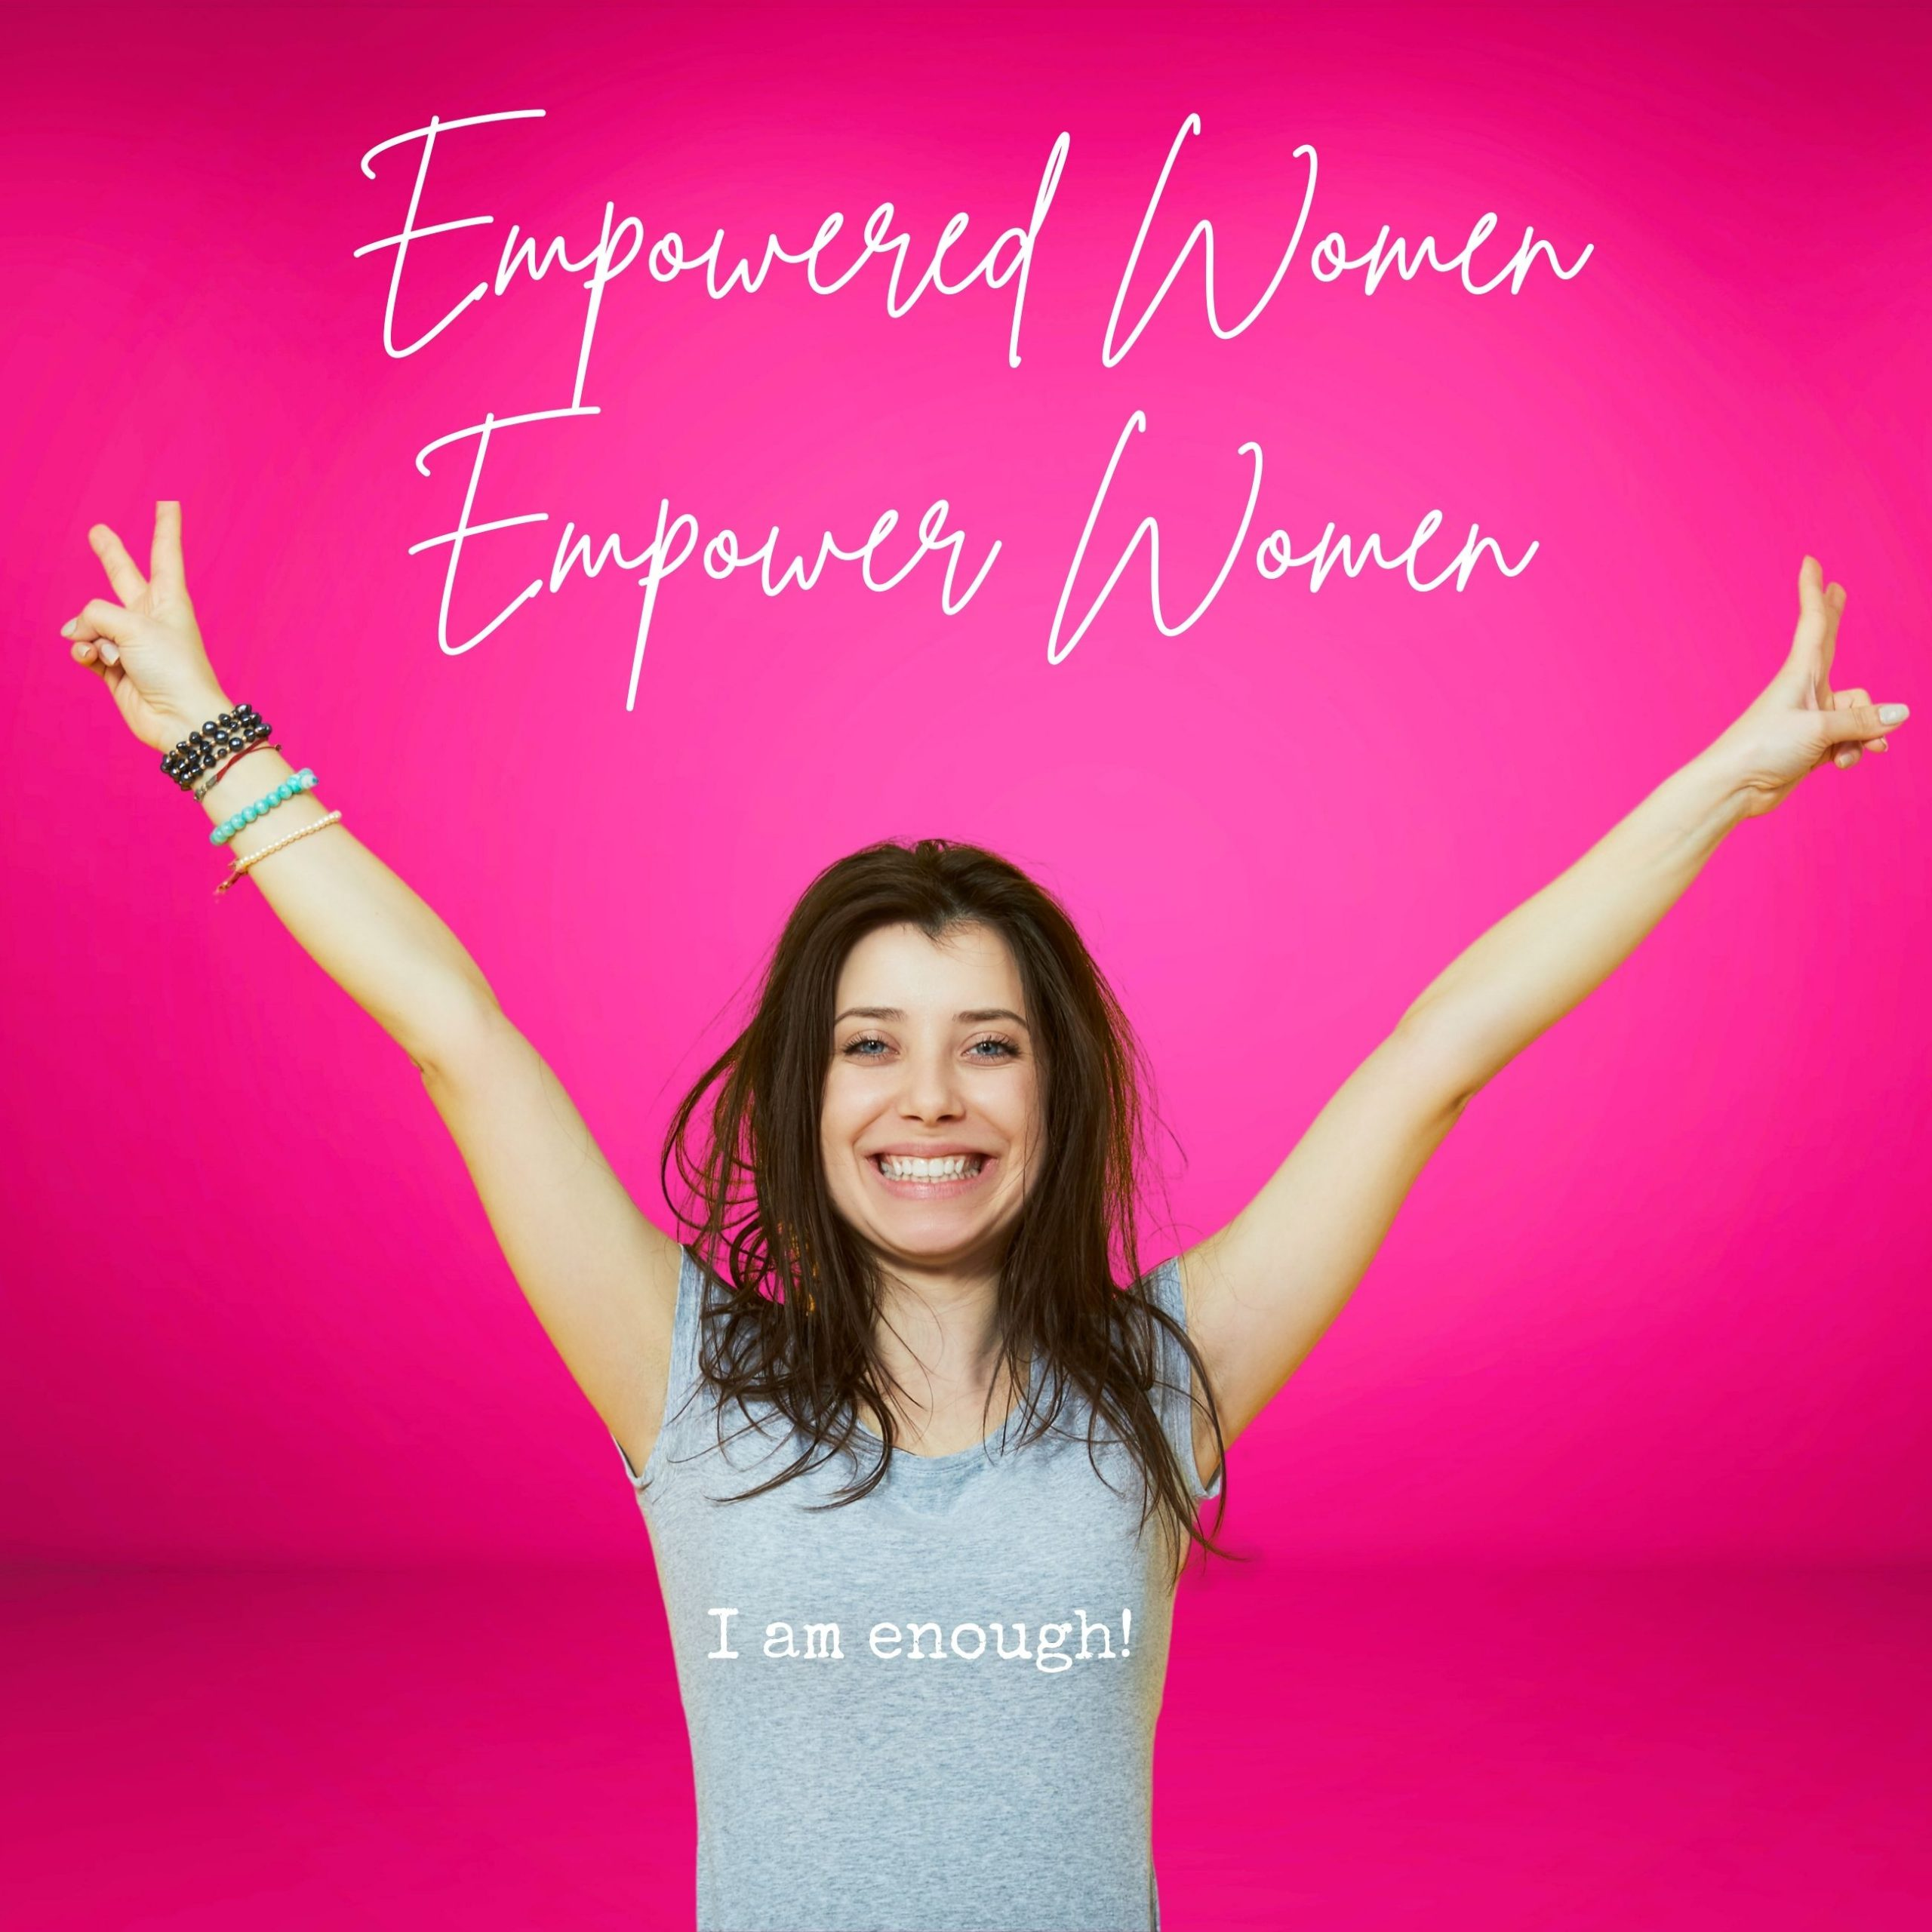 empowered women my happy soul